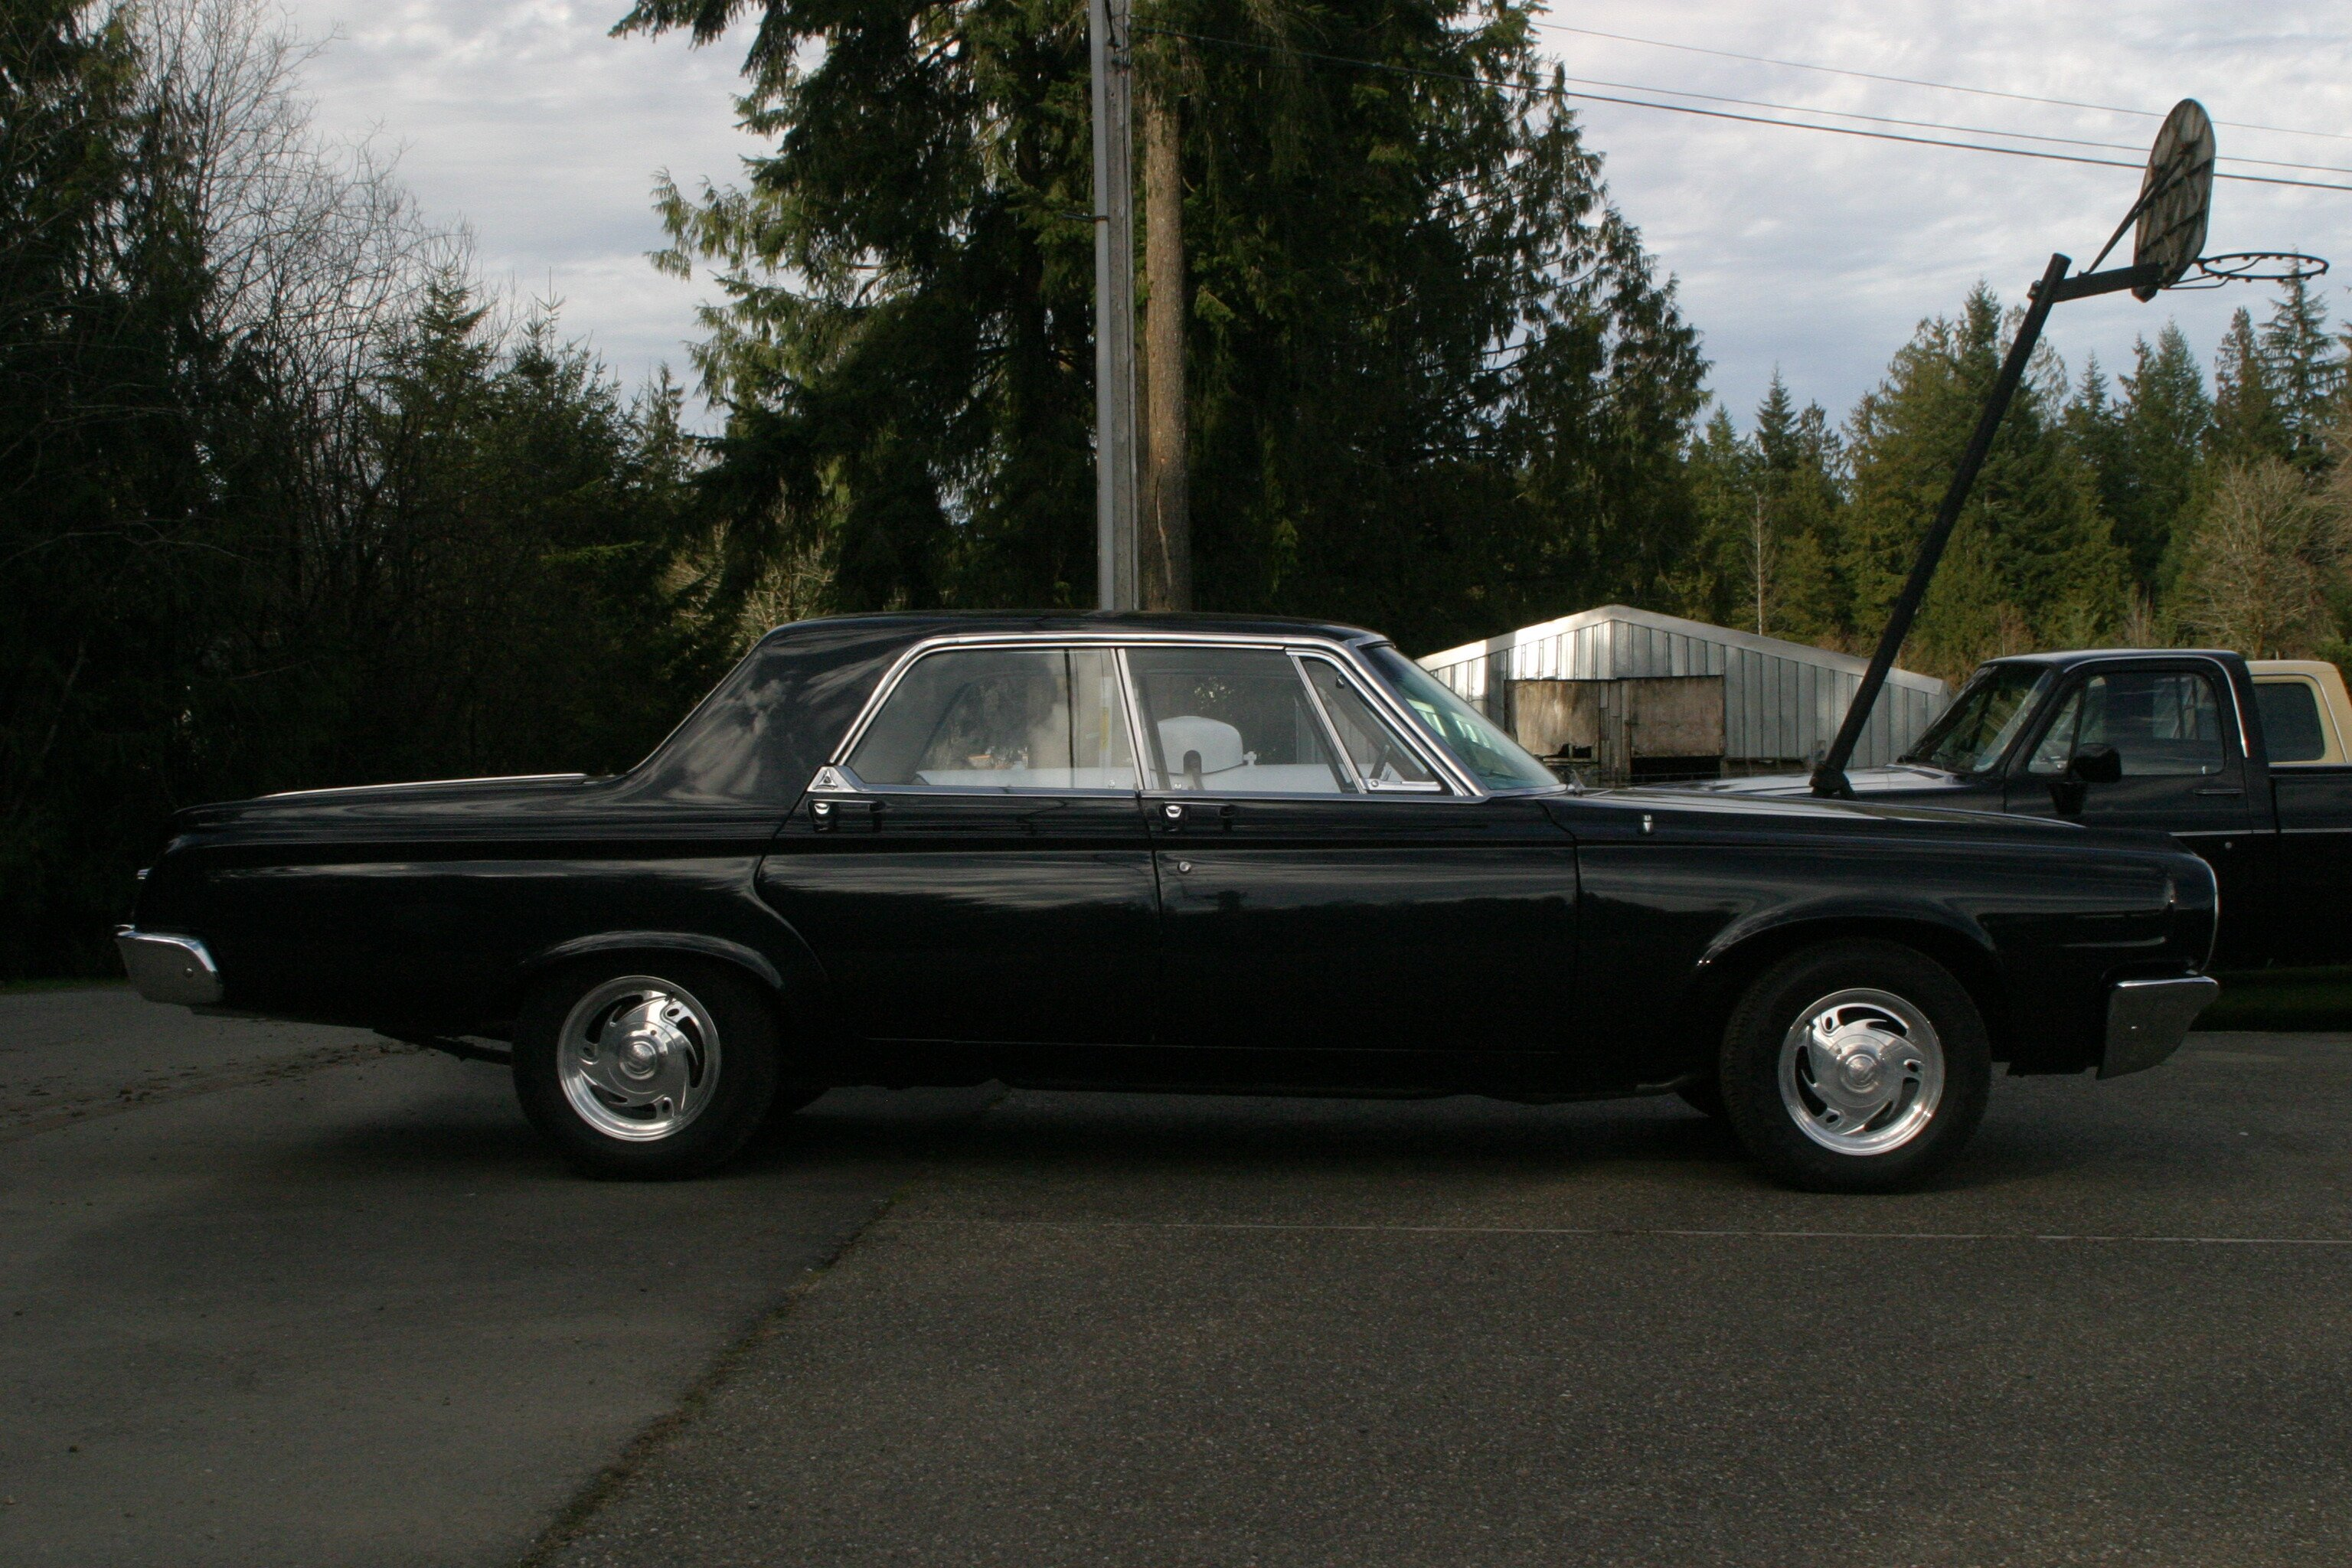 1964 Dodge Polara Wiring Diagram Simple Options Classics For Sale On Autotrader Buick Skylark